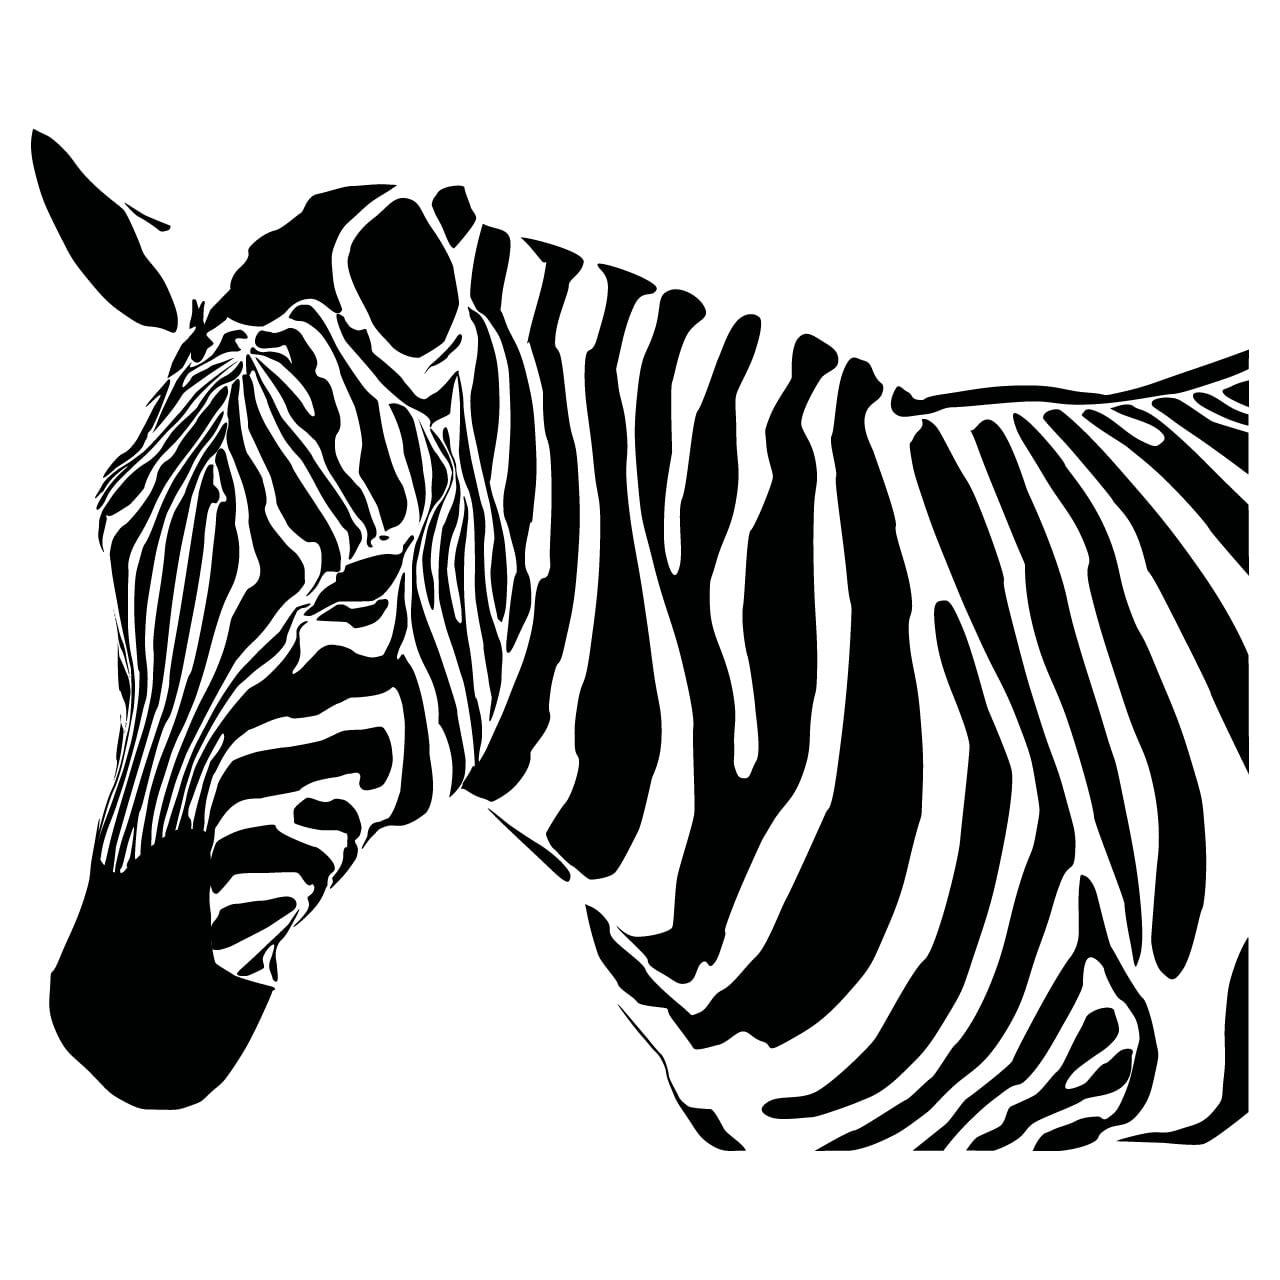 Wall stickers home wall stickers animal wall stickers giraffe wall - Tribal Zebra Viewing Gallery